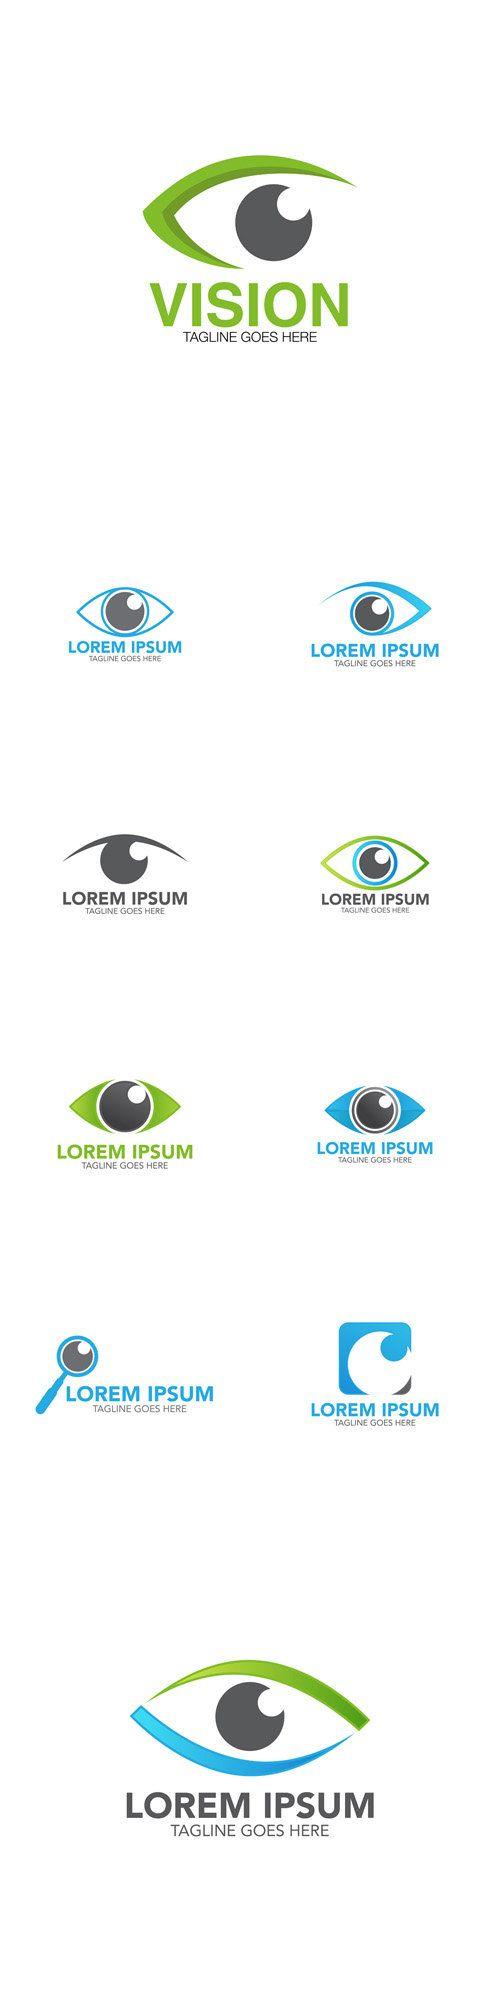 Vectors - Eye Logo Icons